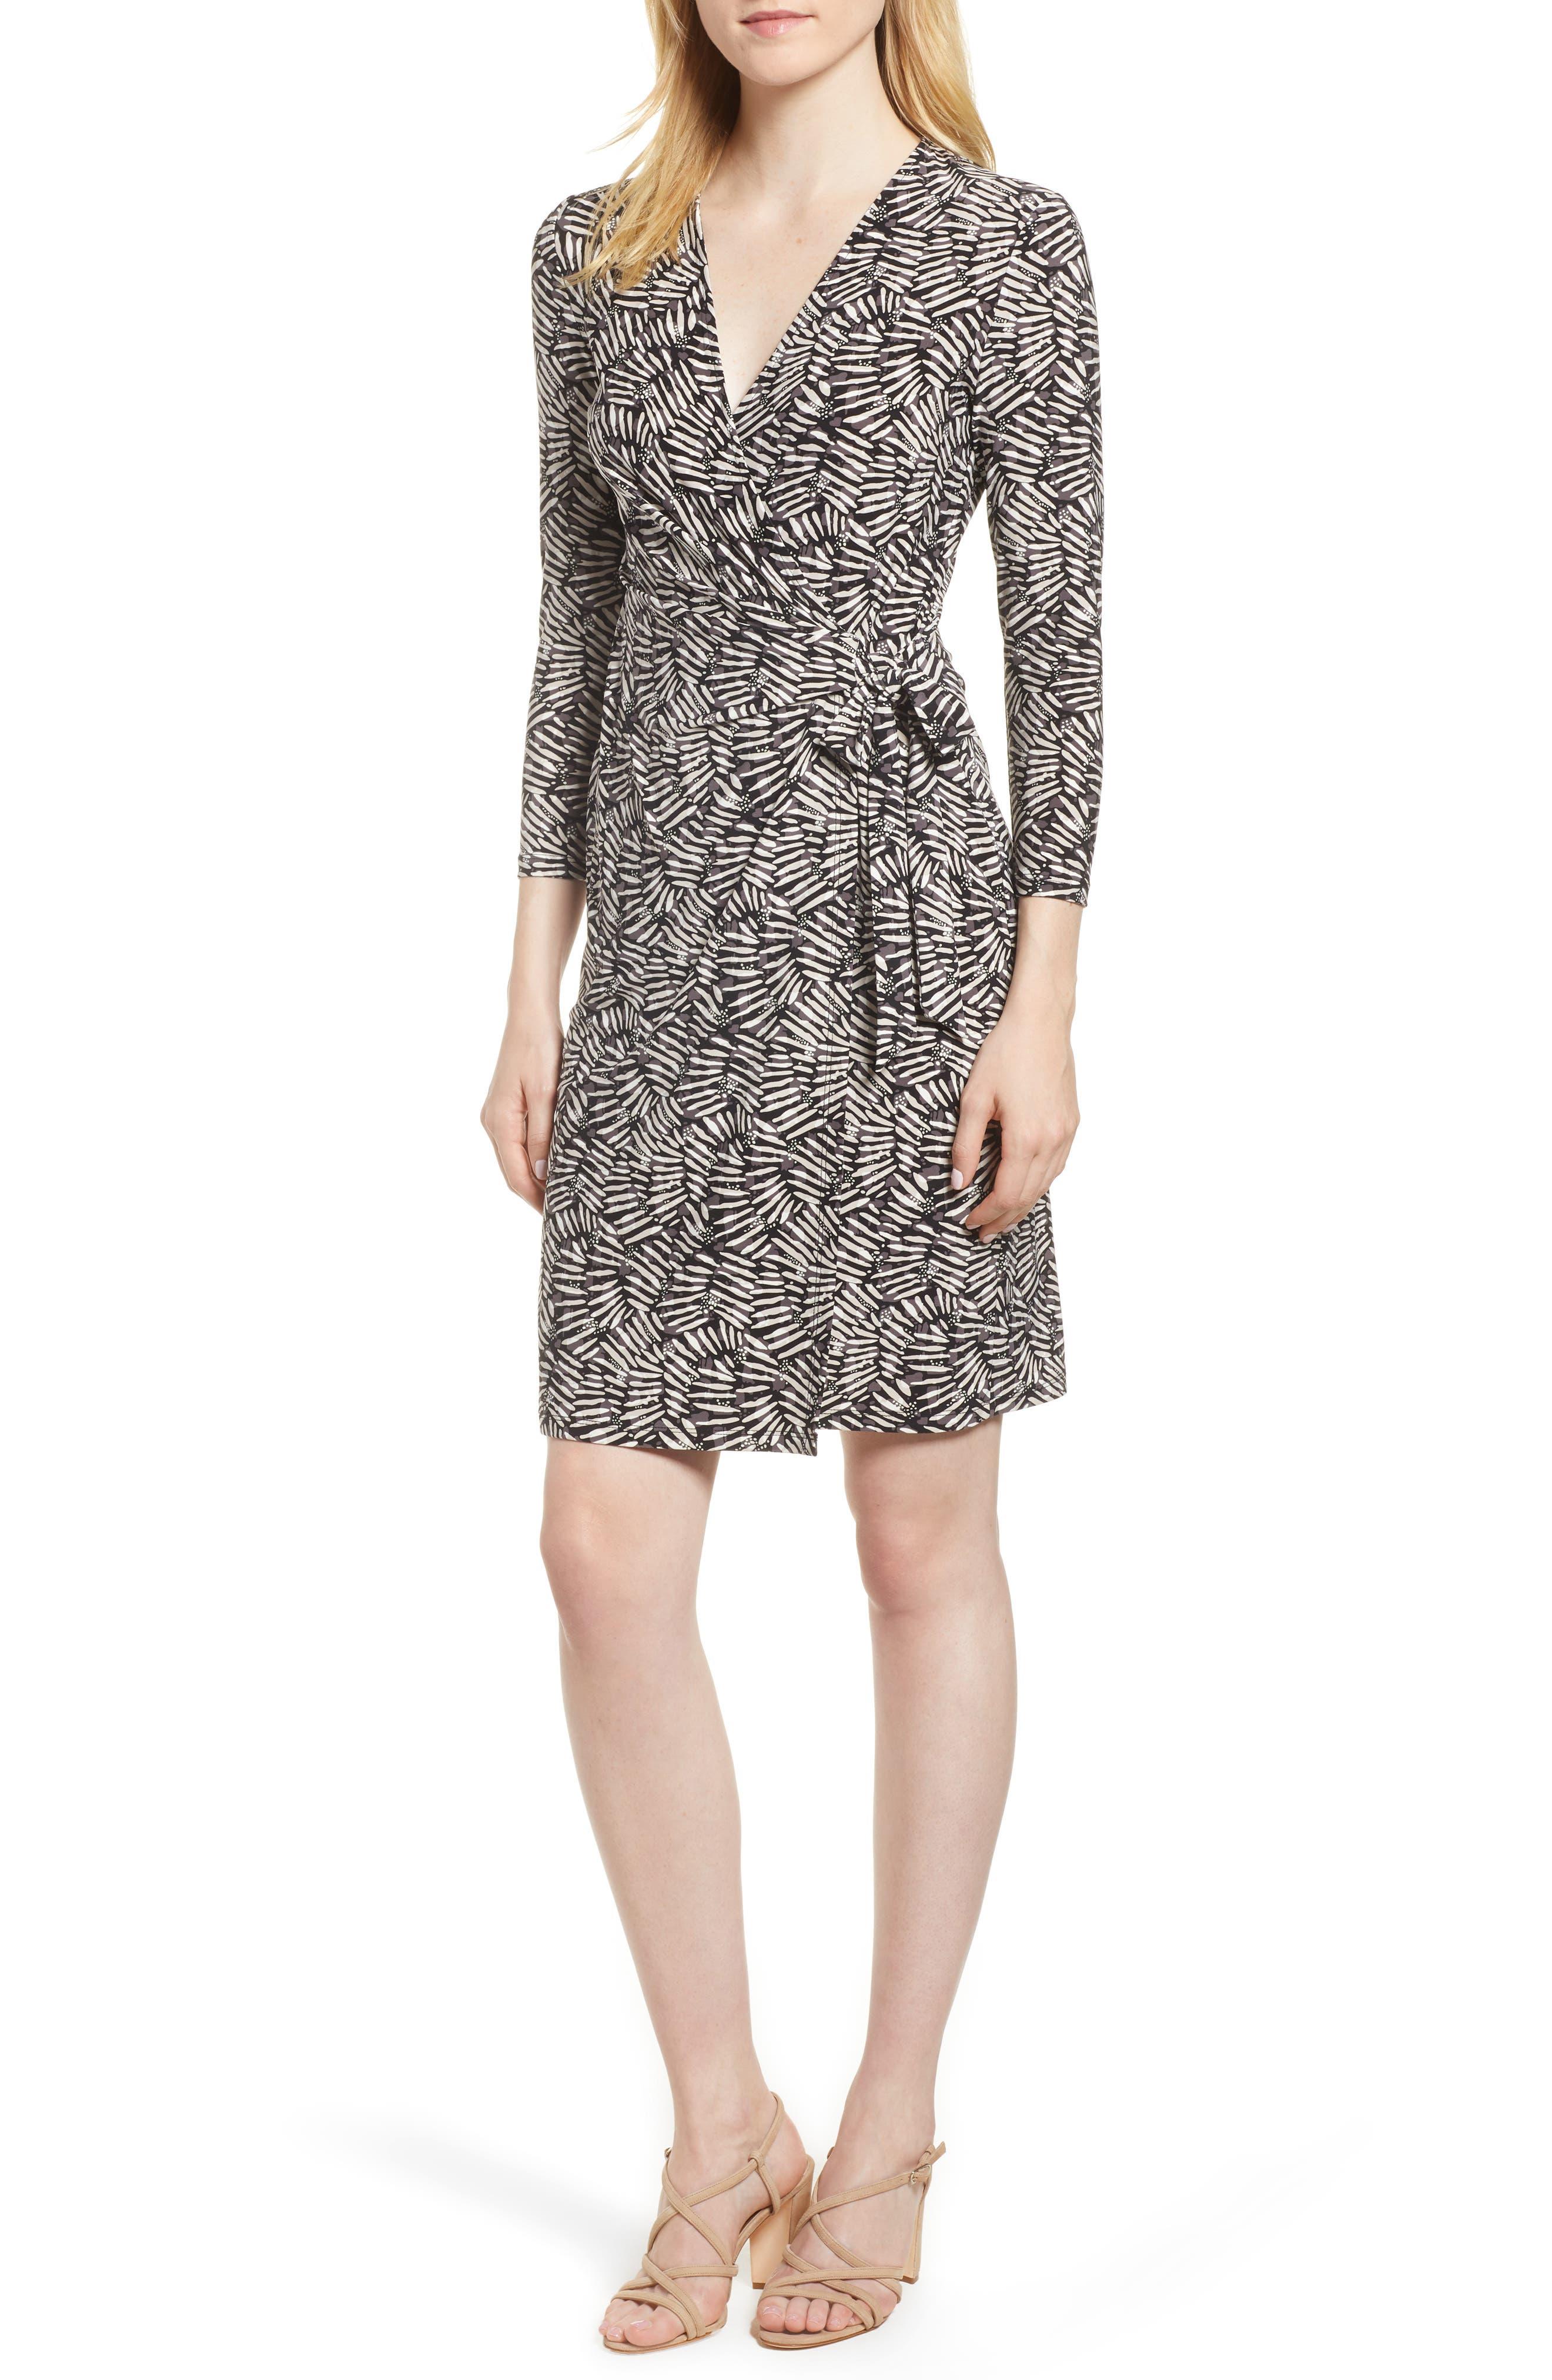 Cedarwood Stretch Crepe Faux Wrap Dress,                             Main thumbnail 1, color,                             Black/ Oyster Shell Combo